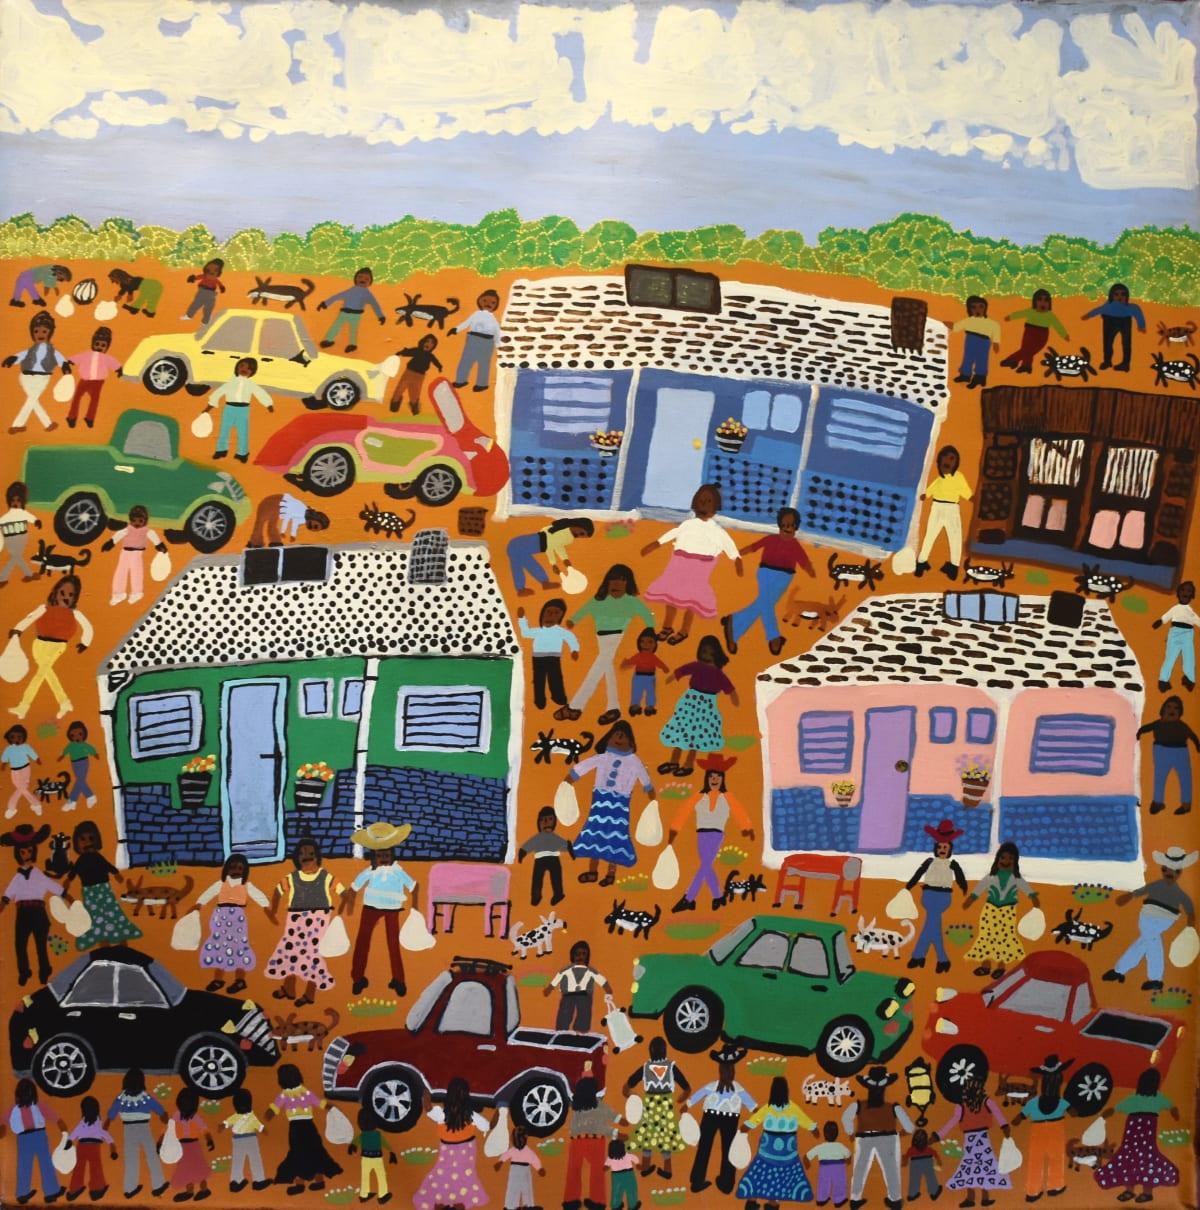 Doris Thomas Pension Day/Titjikala, 2019 Acrylic on Linen 90 x 90 cm